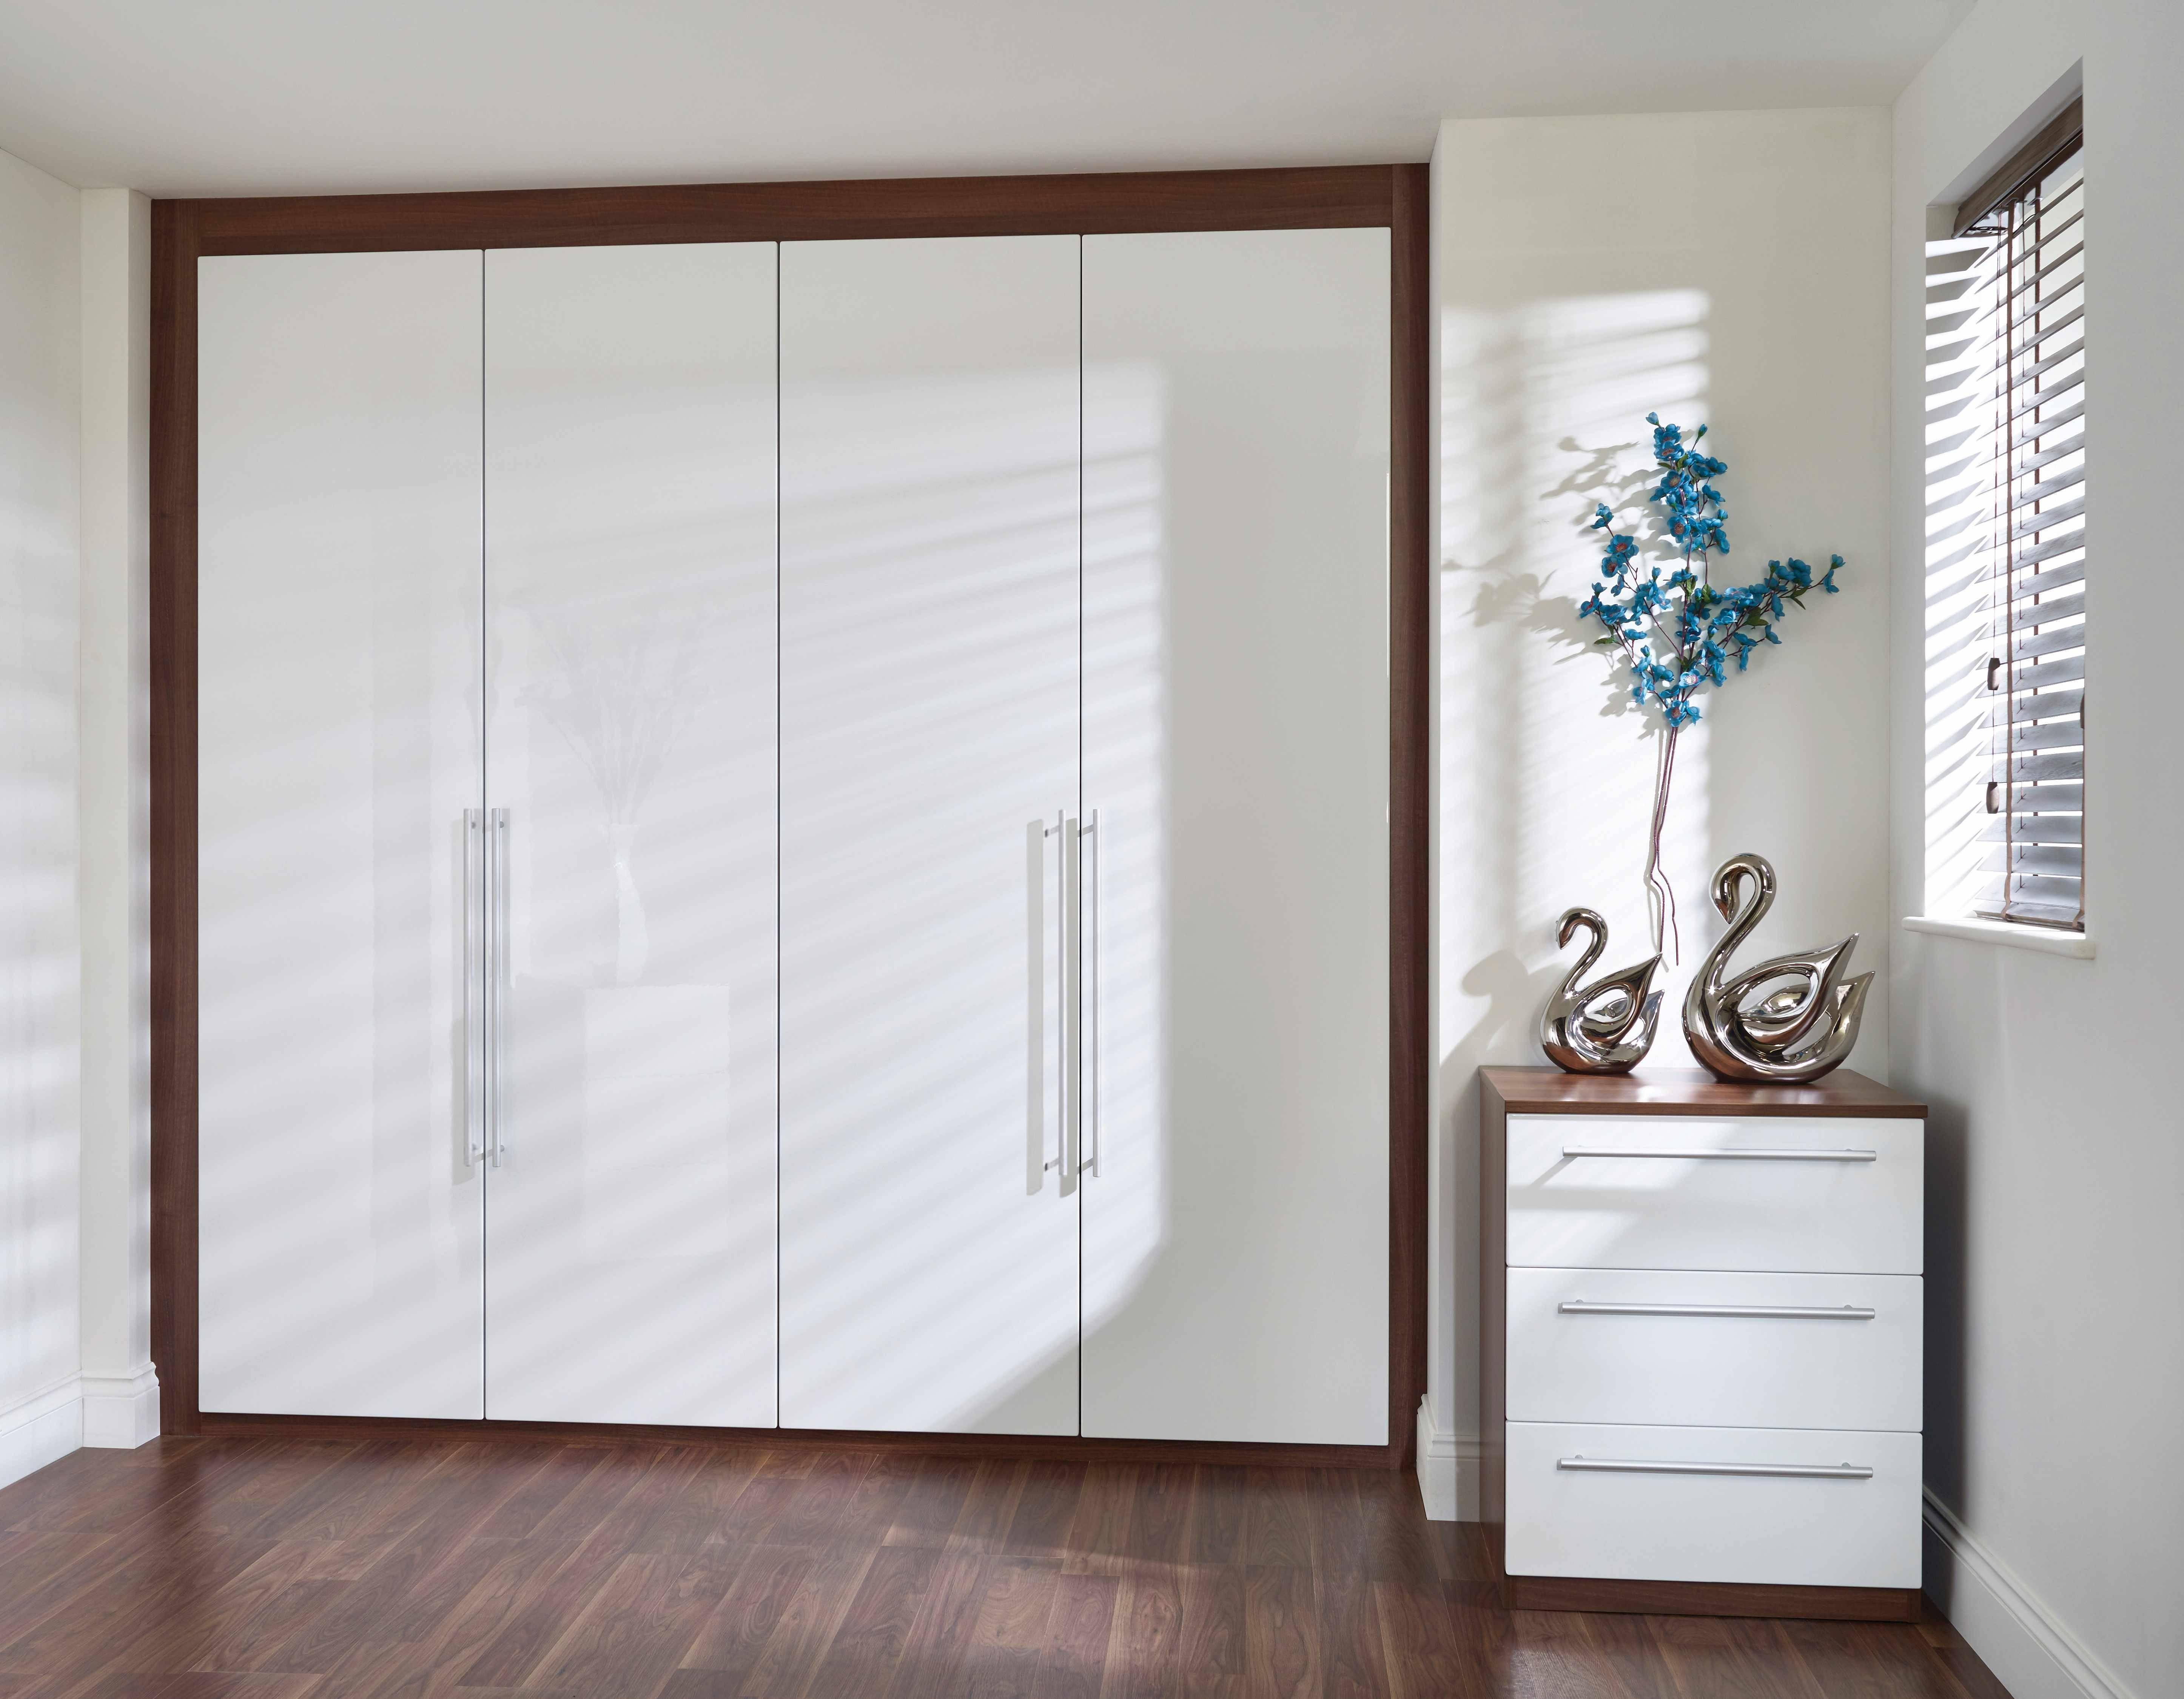 Plain White High Gloss Wardrobe - Tidy Bedroomstidy Bedrooms intended for High Gloss White Wardrobes (Image 8 of 15)